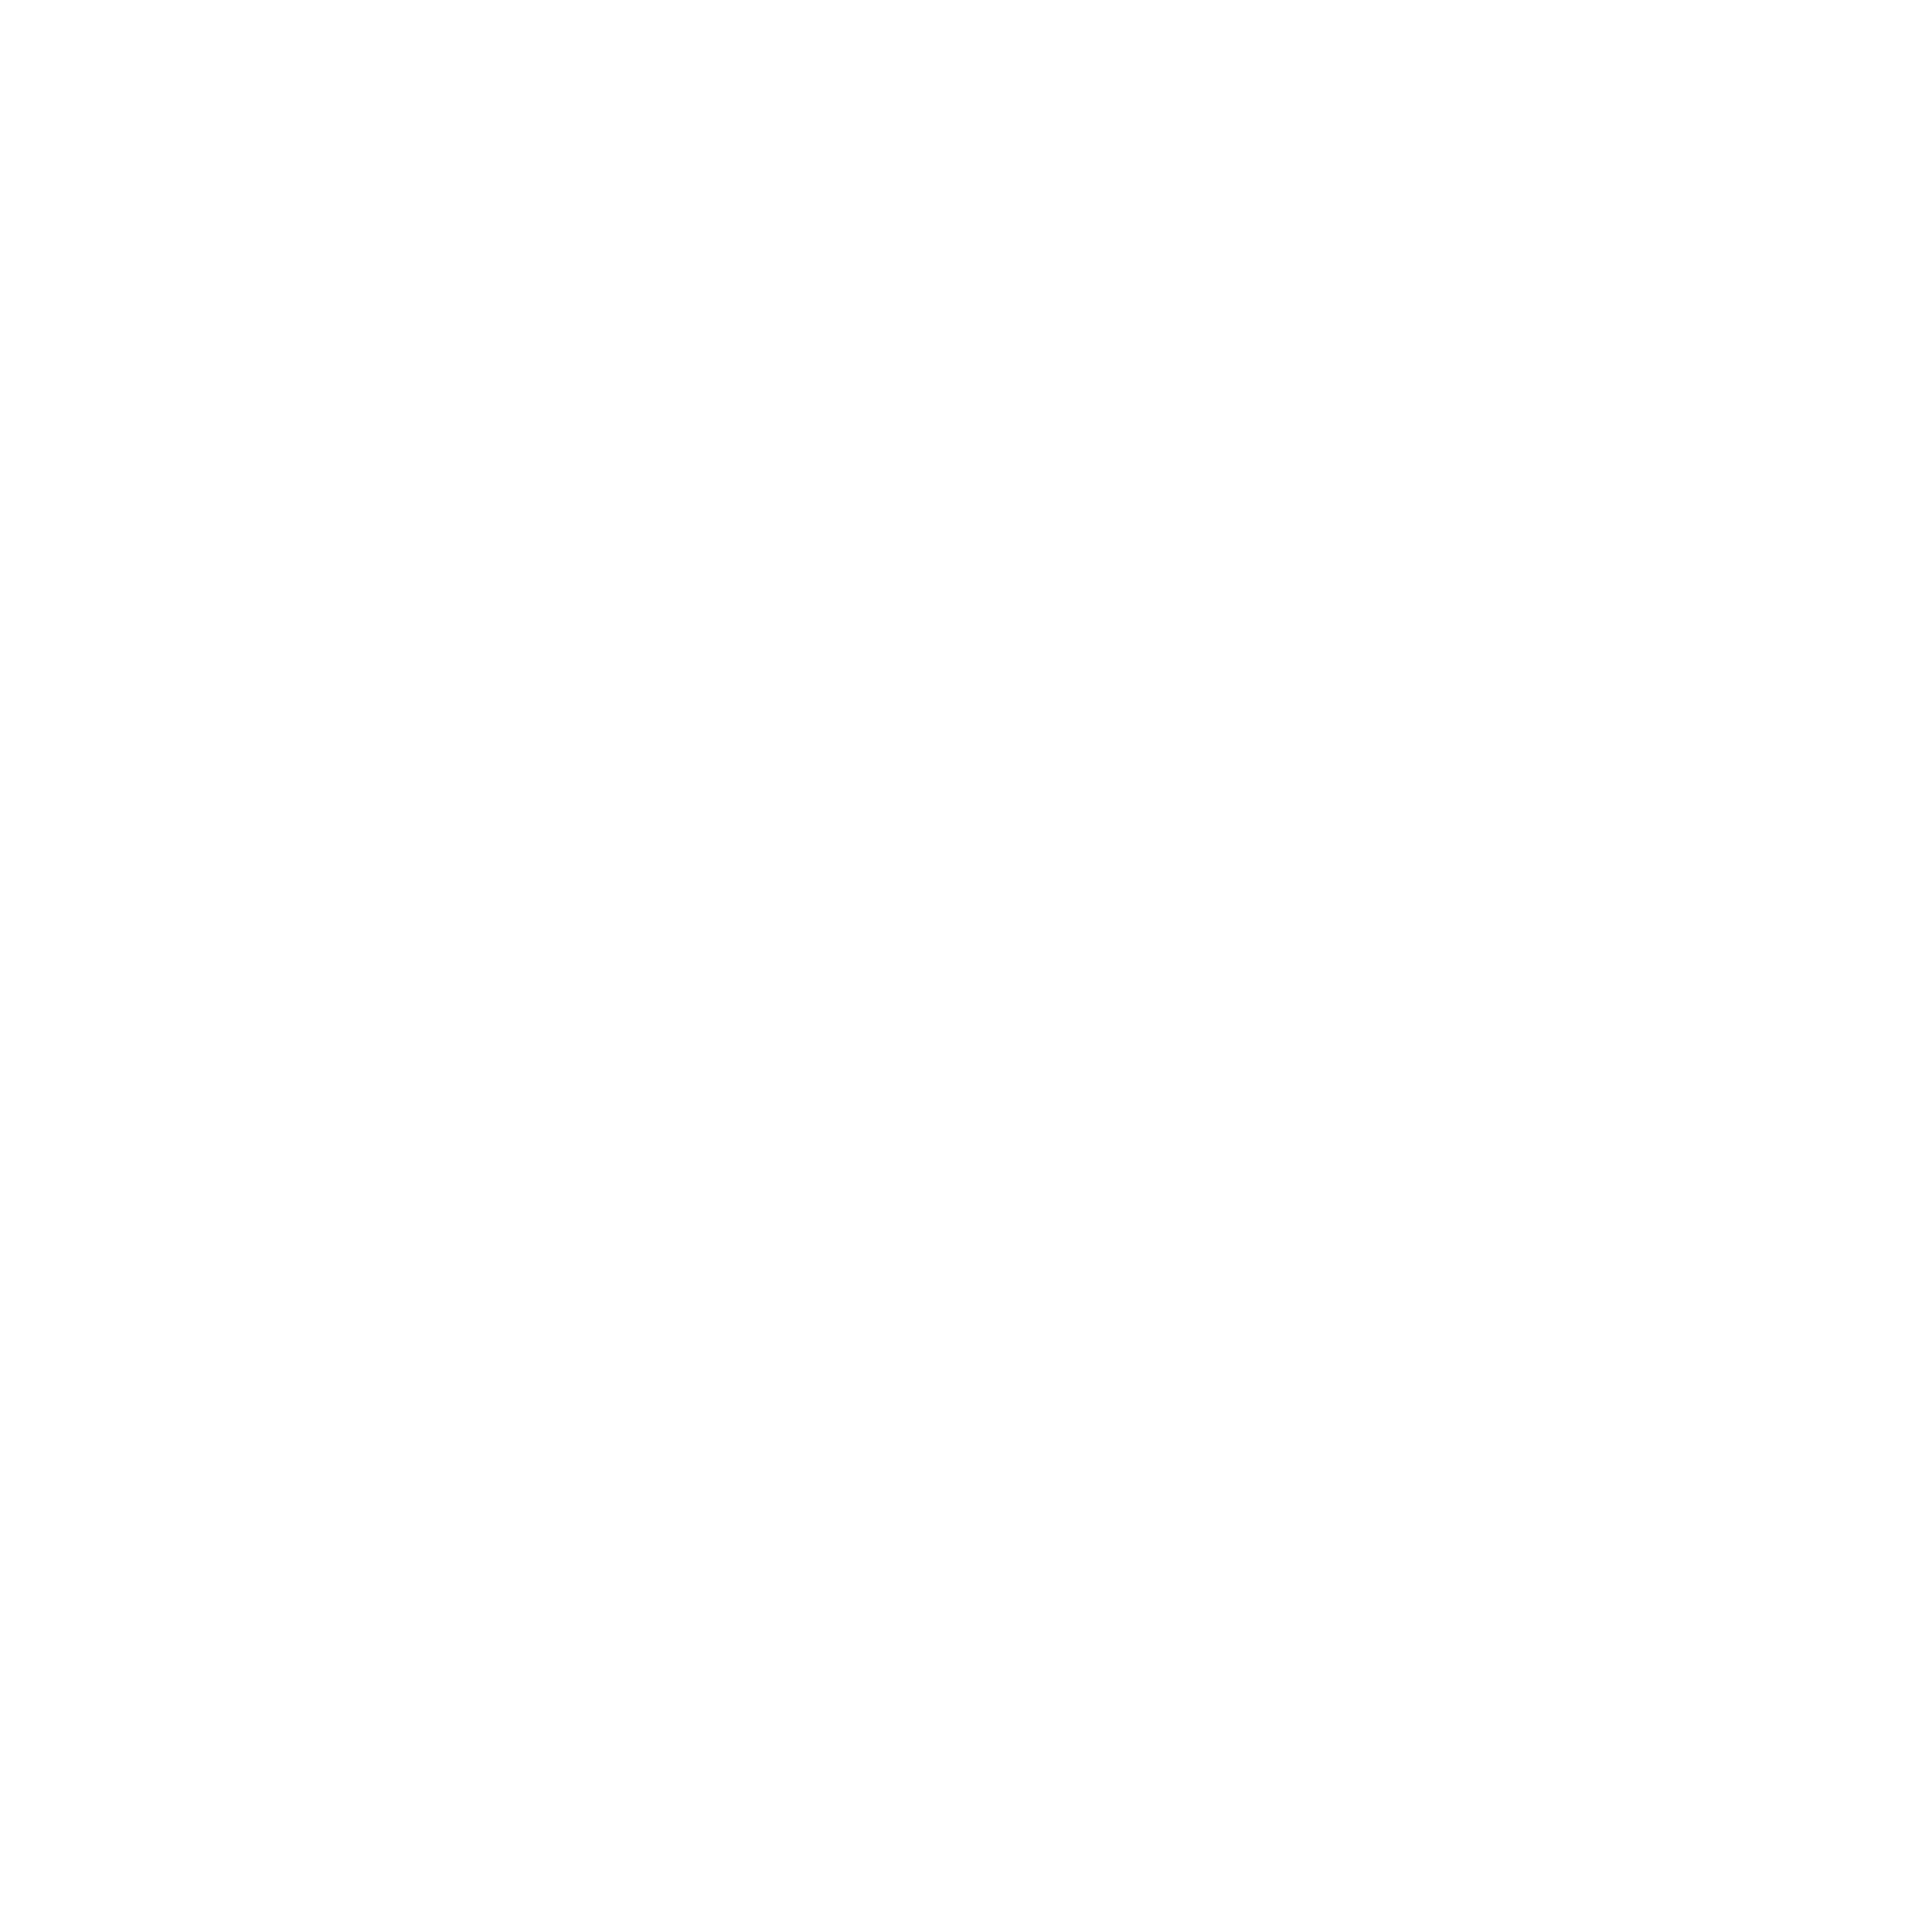 Railcar Location Tracking